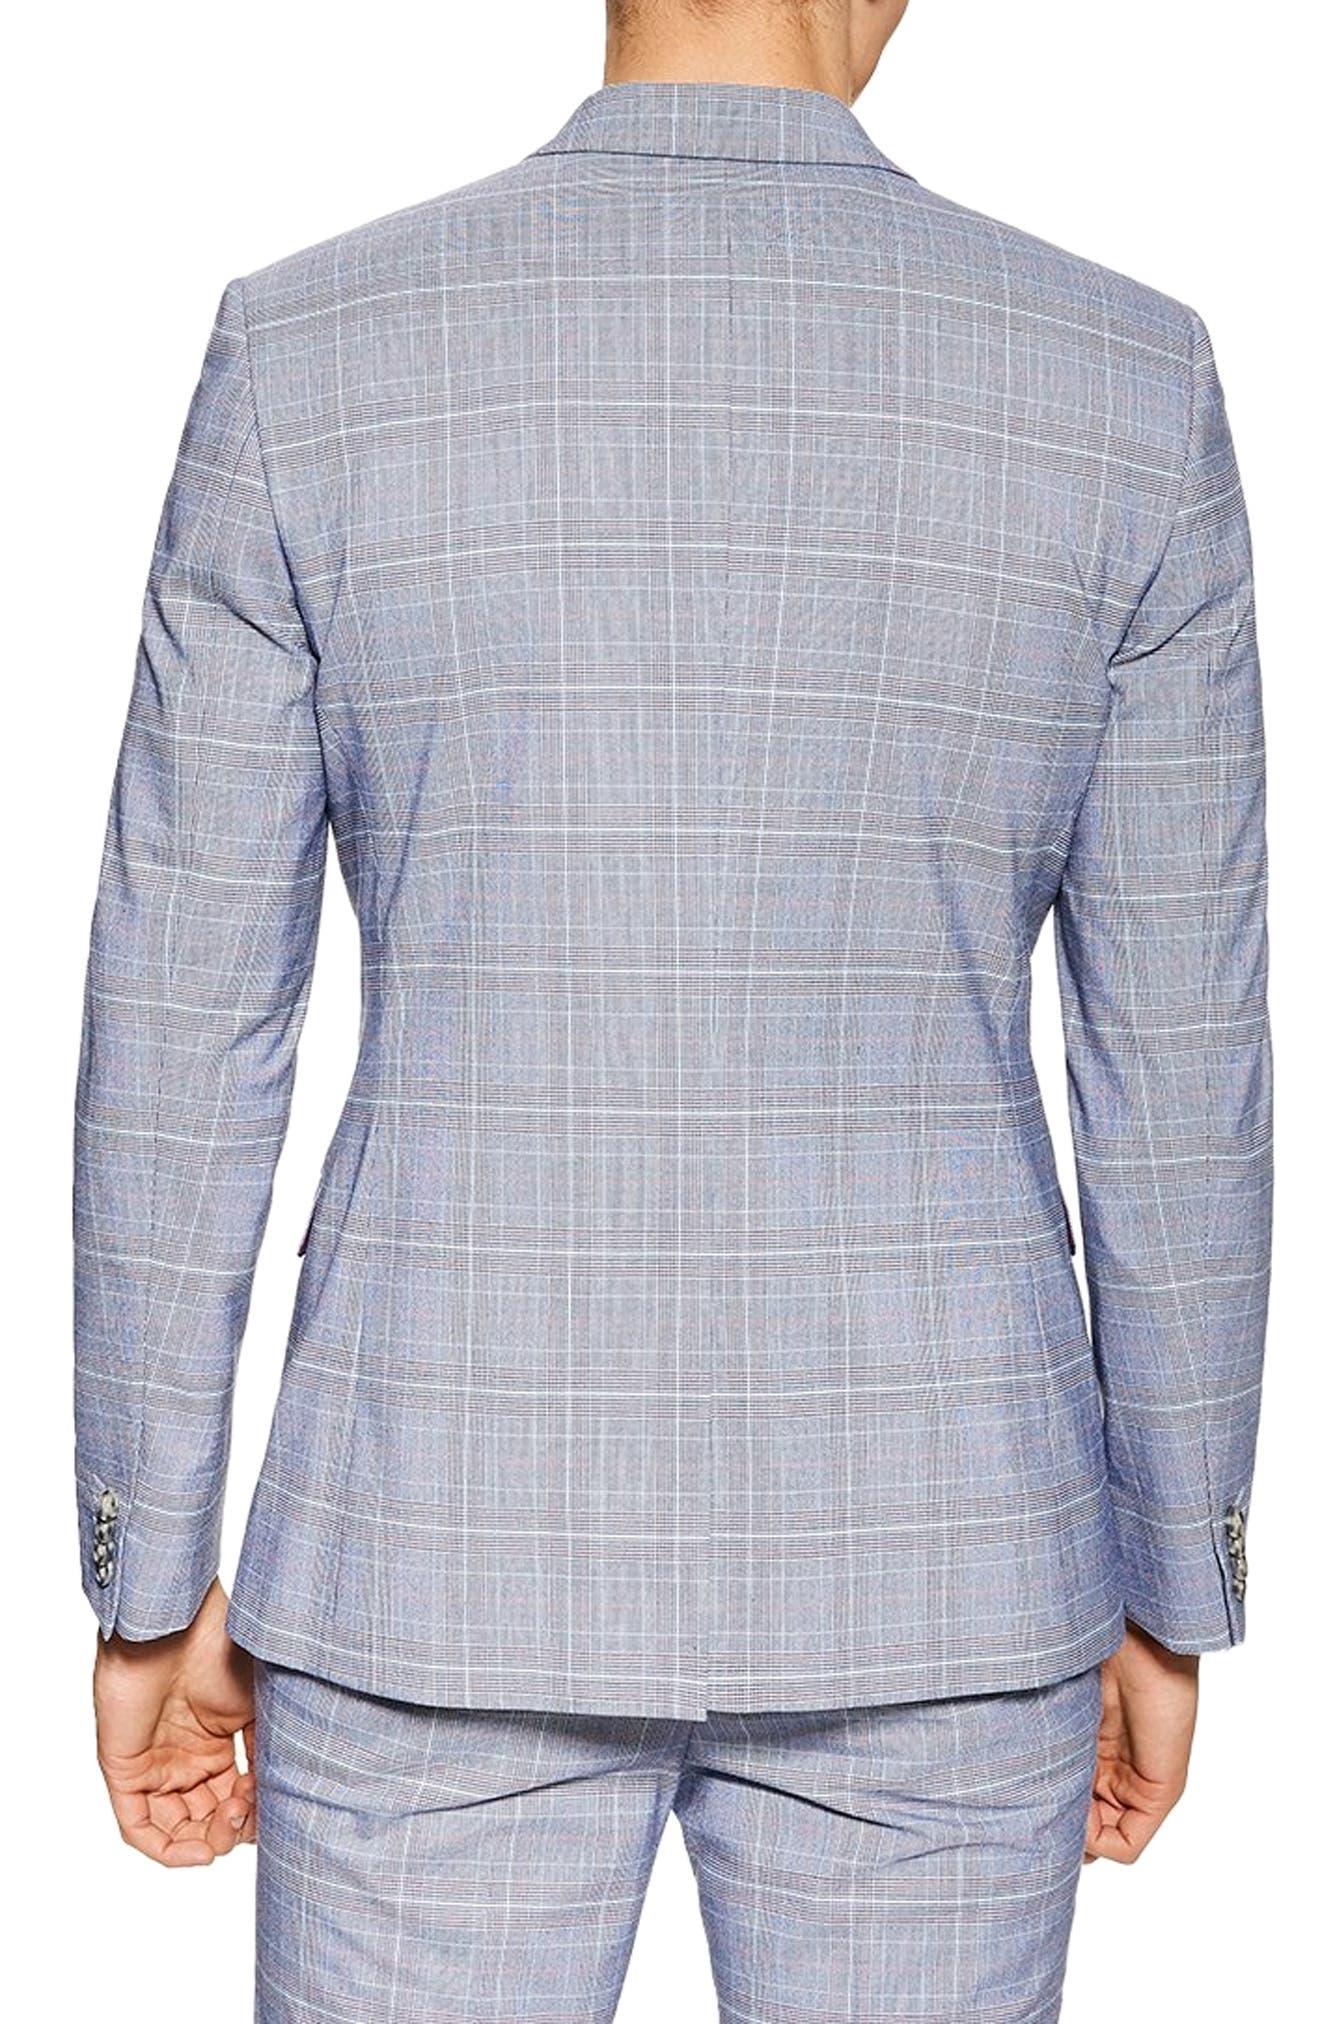 TOPMAN, Skinny Fit Suit Jacket, Alternate thumbnail 2, color, BLUE MULTI